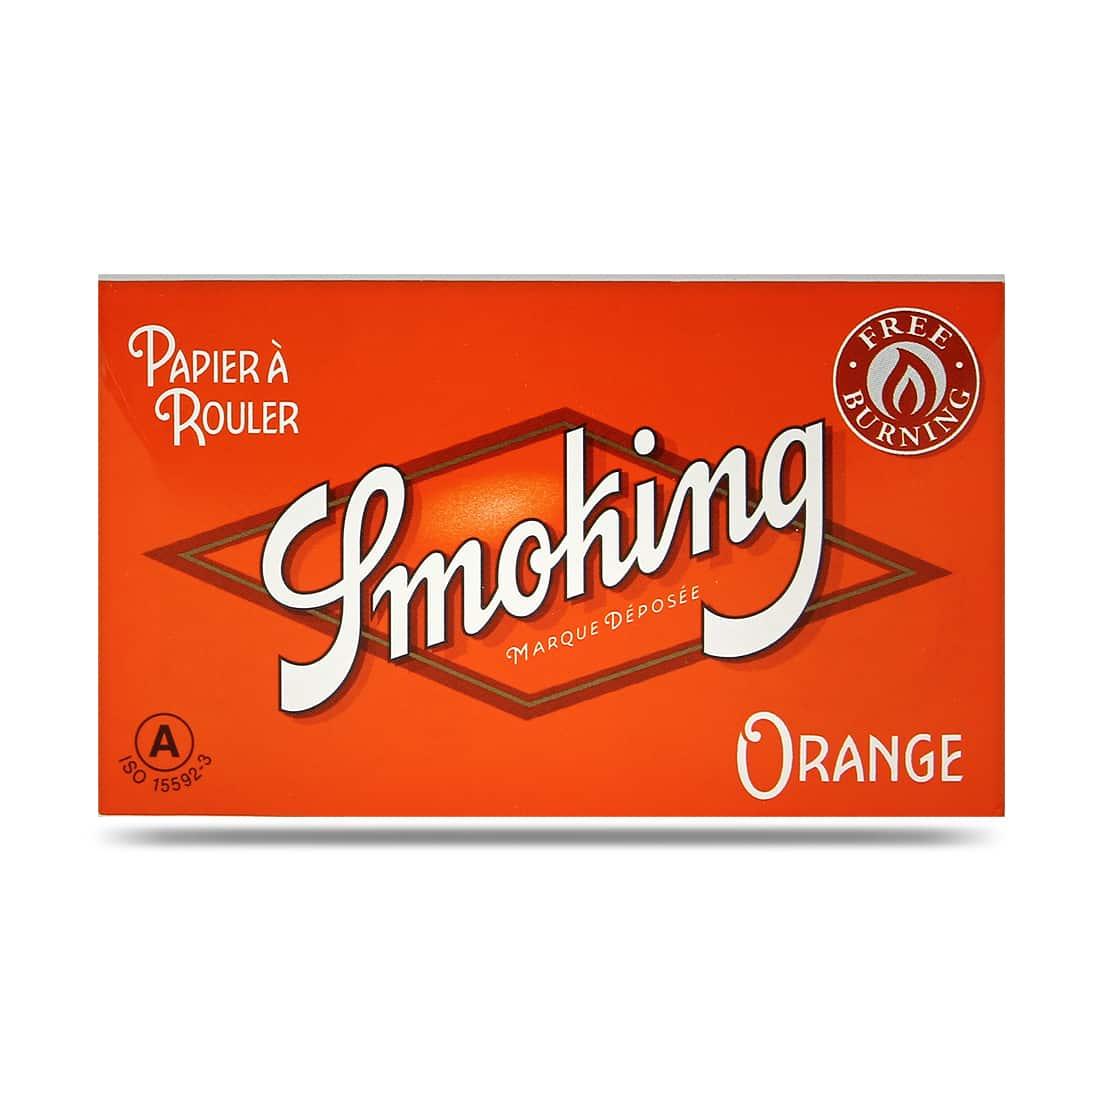 Photo #4 de Pack Découverte Feuille a rouler Smoking Regular